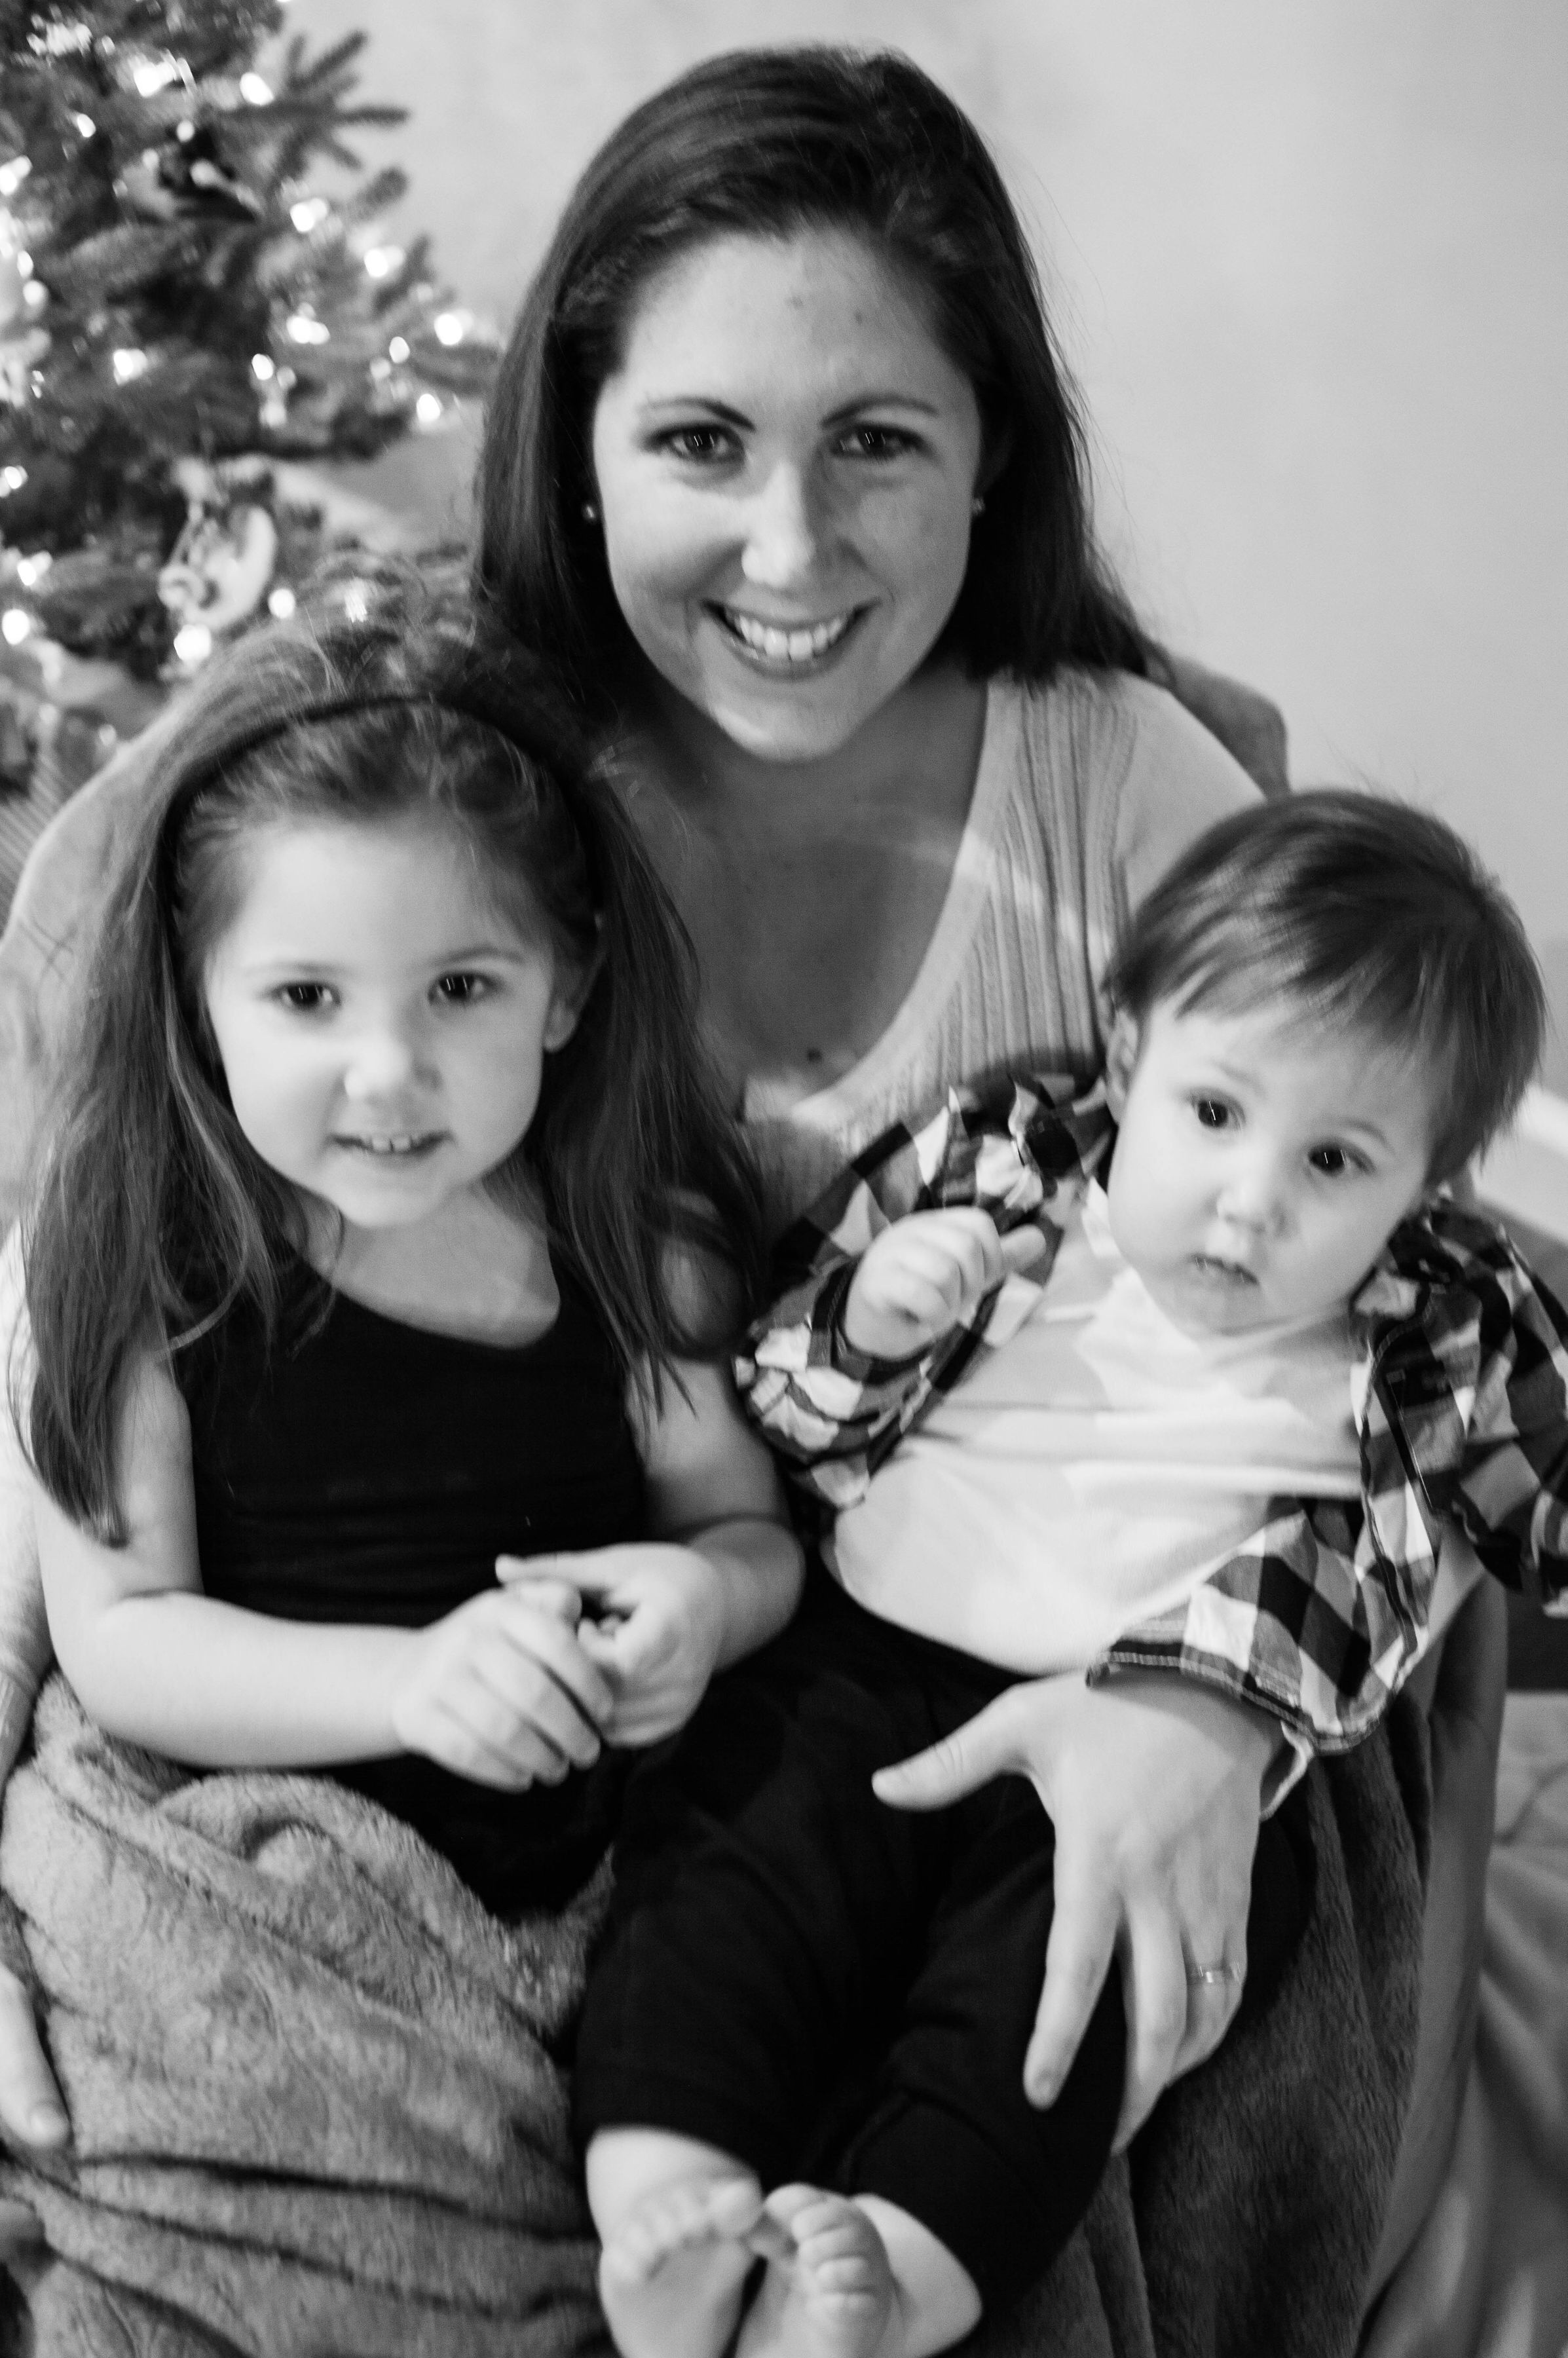 Kat Nielsen and family